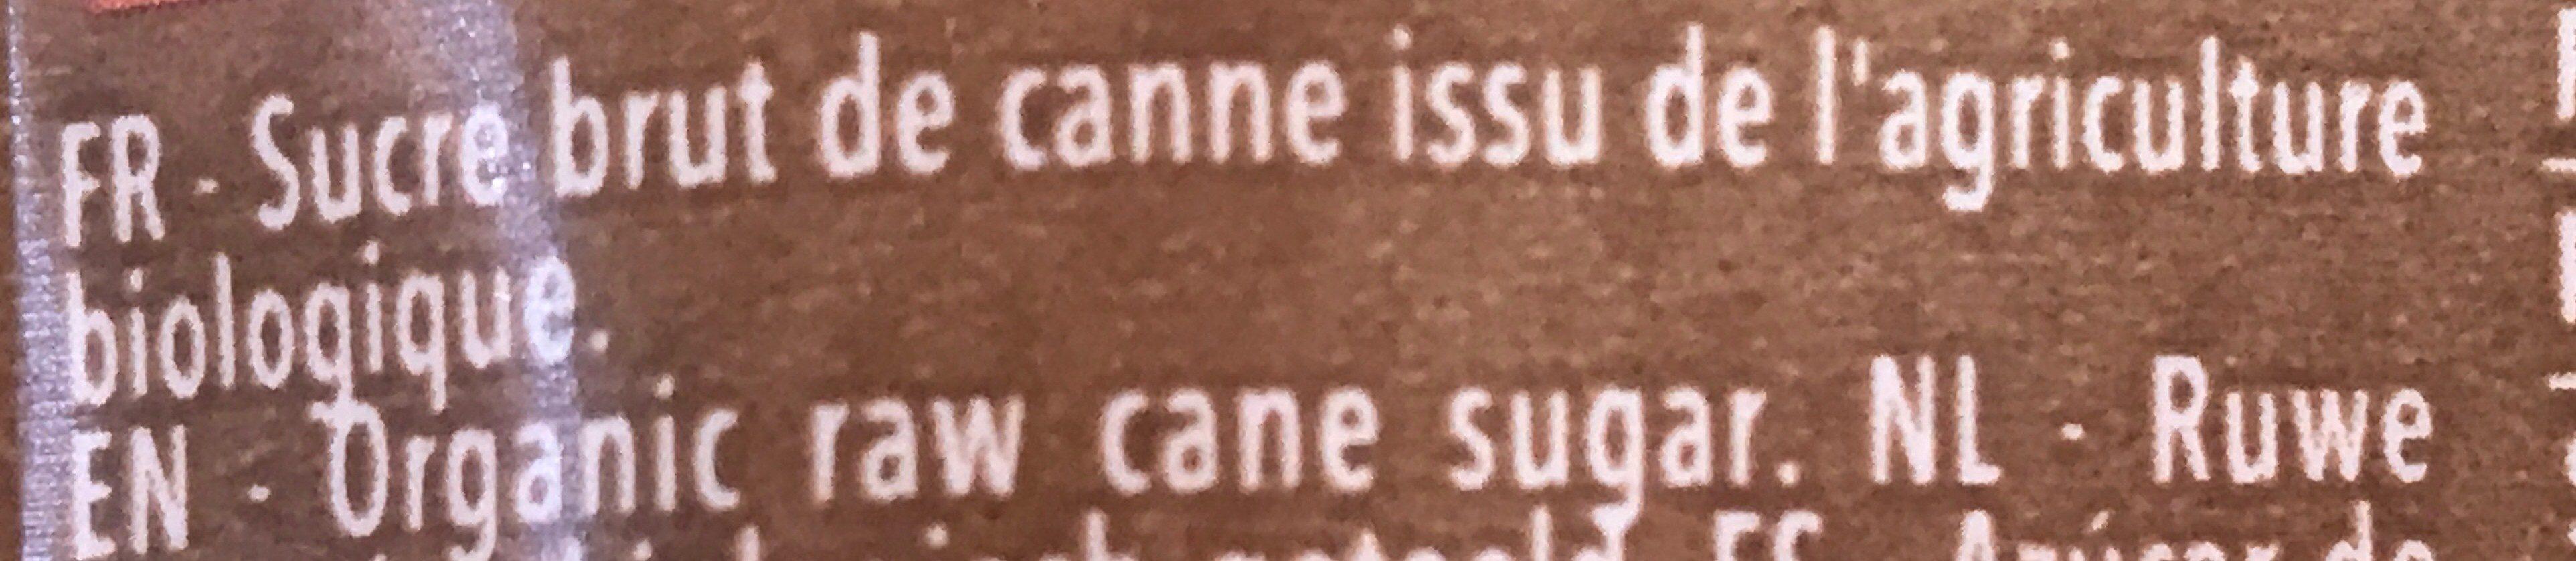 Sucre complet Muscovado - Ingredients - fr